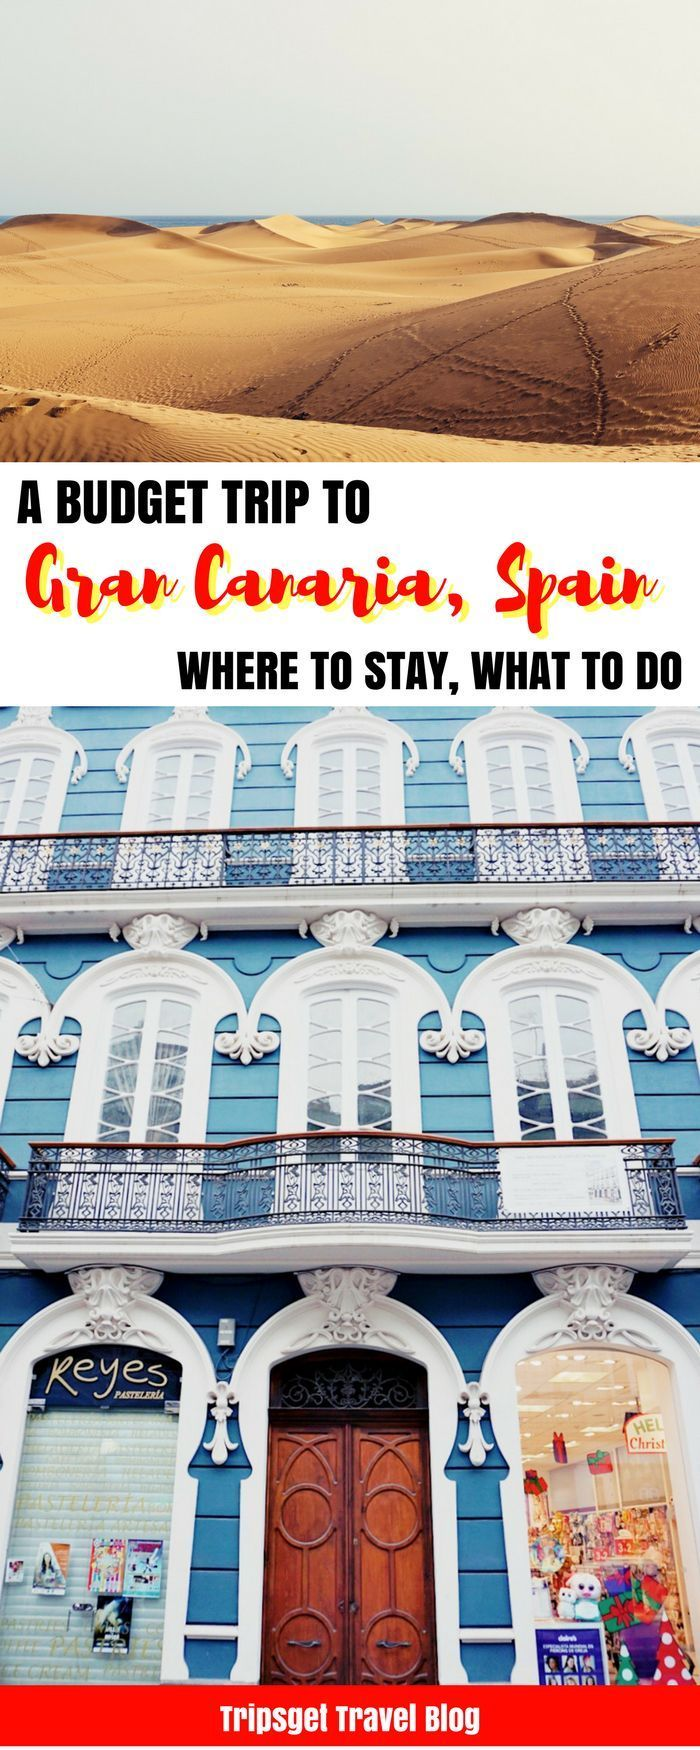 A budget weekend trip to Gran Canaria, Canary Islands, Spain in November. Gran Canaria in Autumn. Las Palmas. Sand Dunes Gran Canaria, Maspalomas